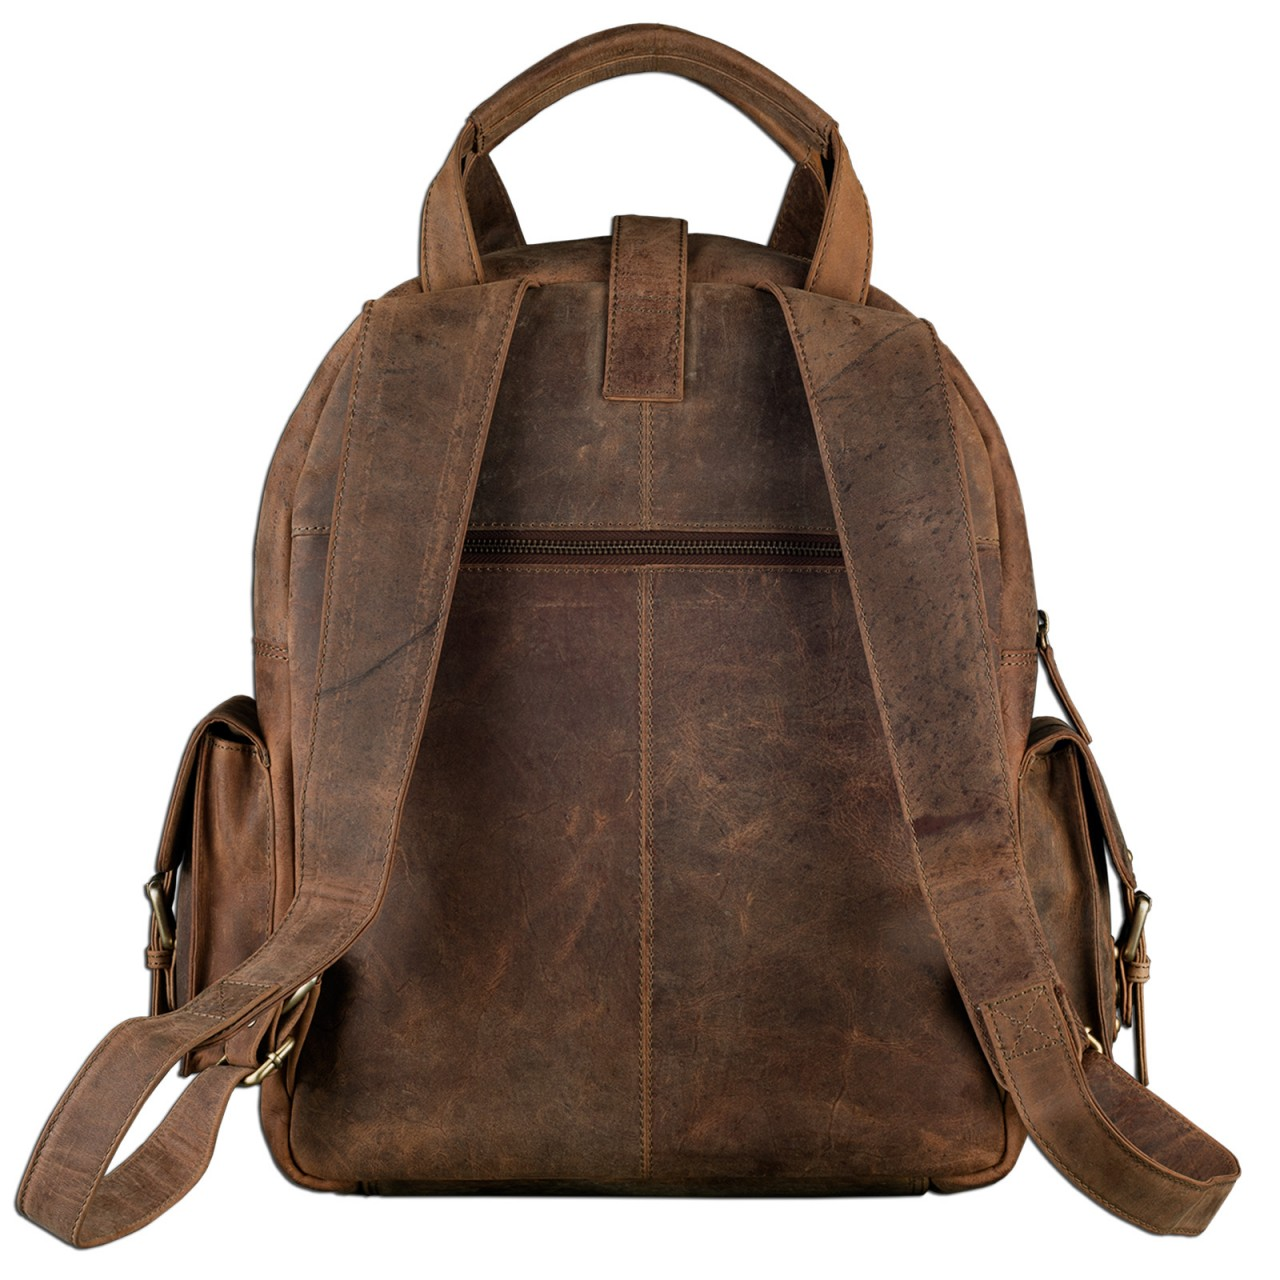 "STILORD ""Nevada"" Rucksack Leder groß im Vintage Design mit 13,3 Zoll Laptopfach Unisex Lederrucksack Uni Schule Lehrer Echtleder  - Bild 3"